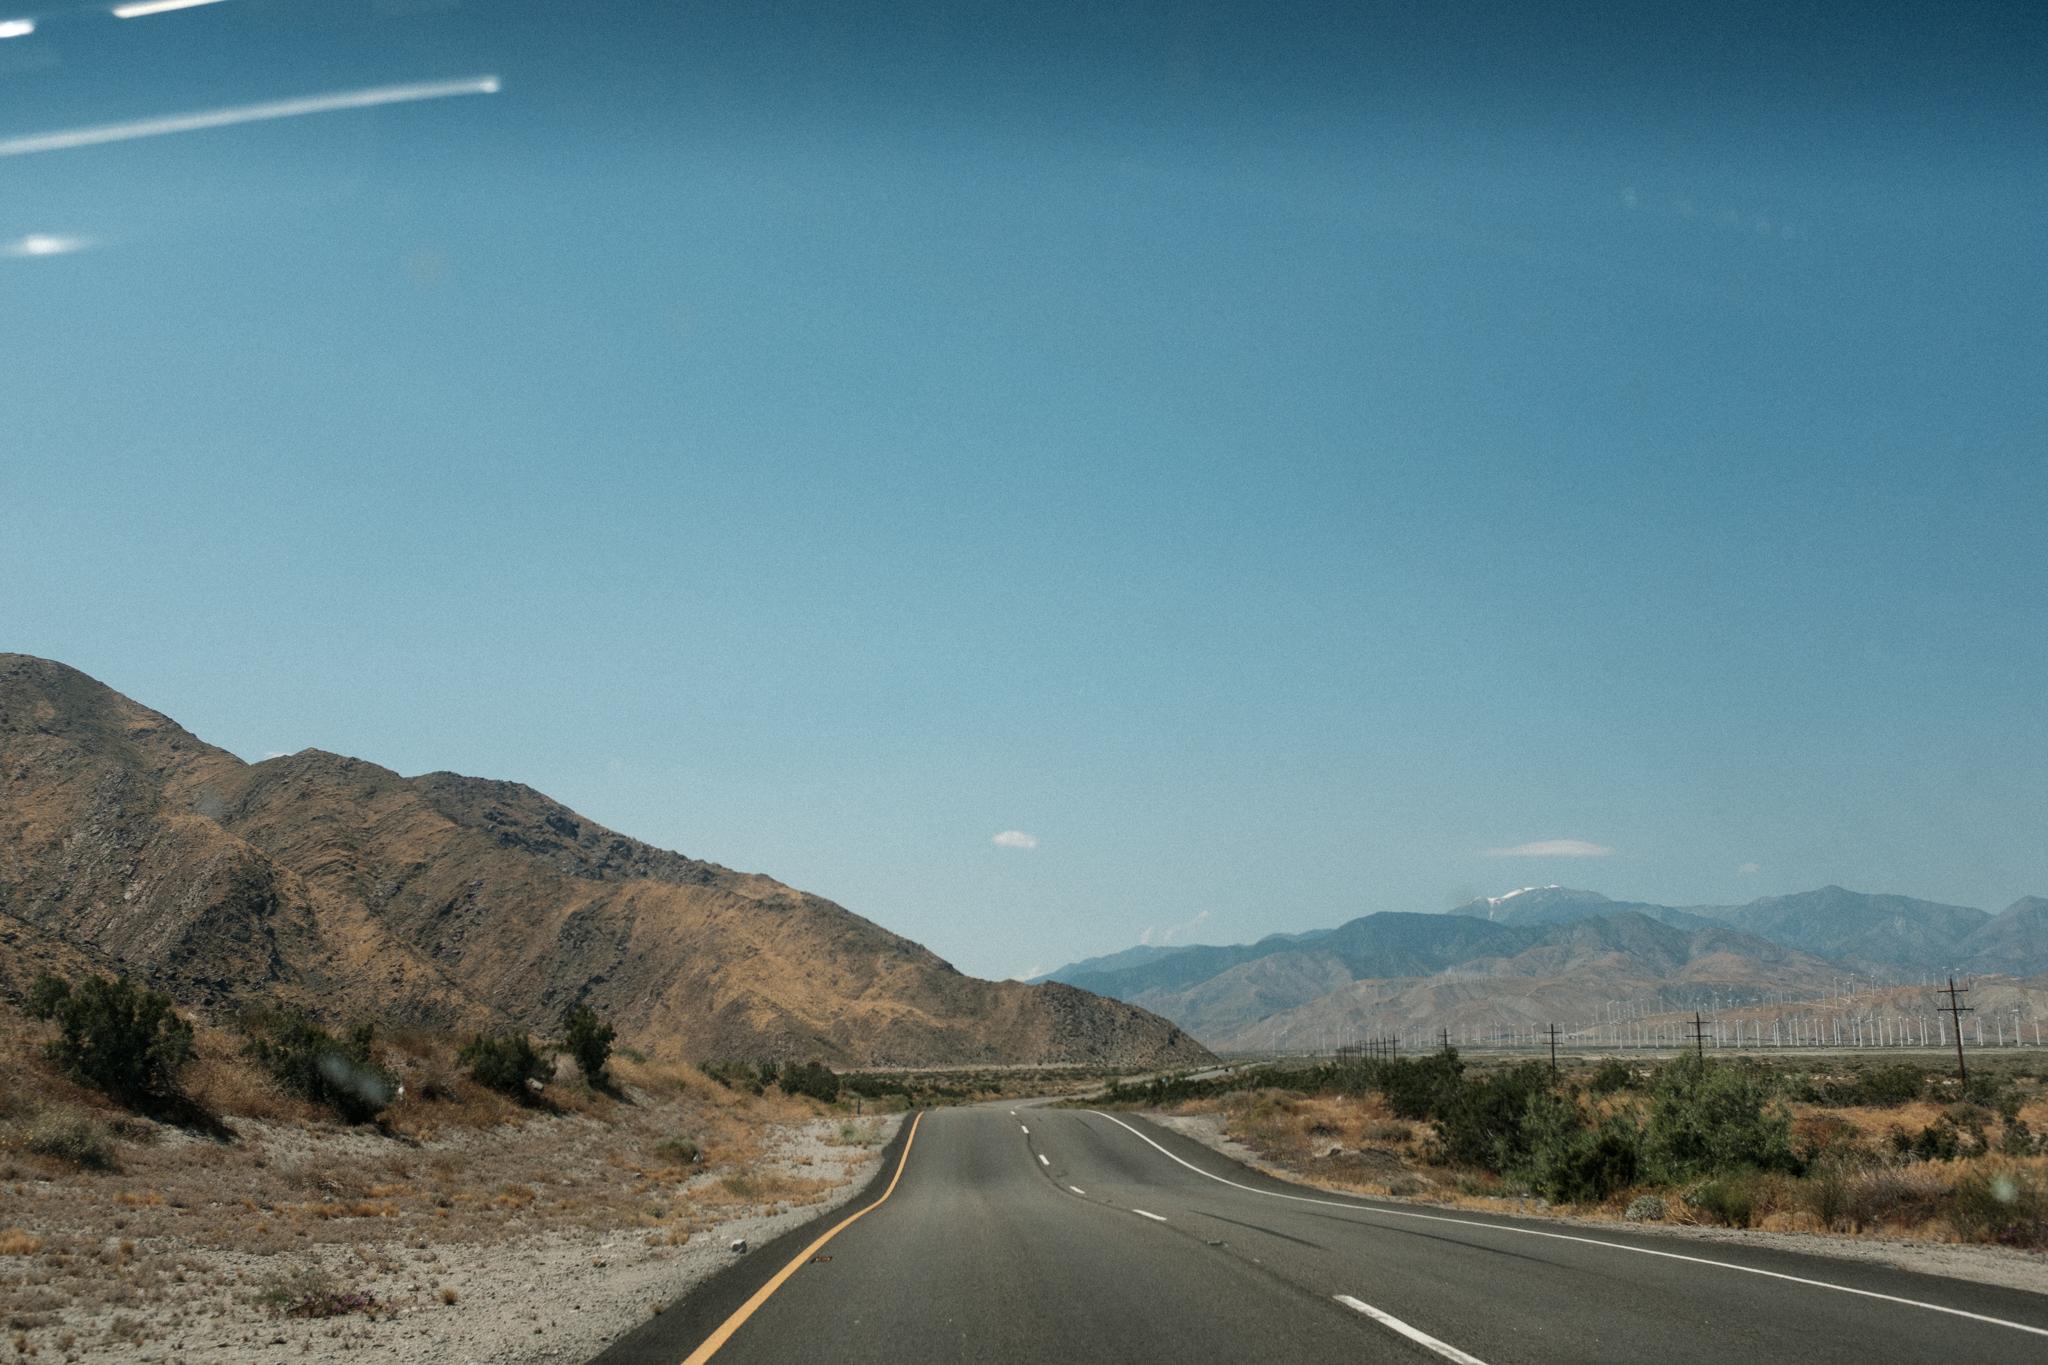 170418 Coachella 17 w1 1514.jpg